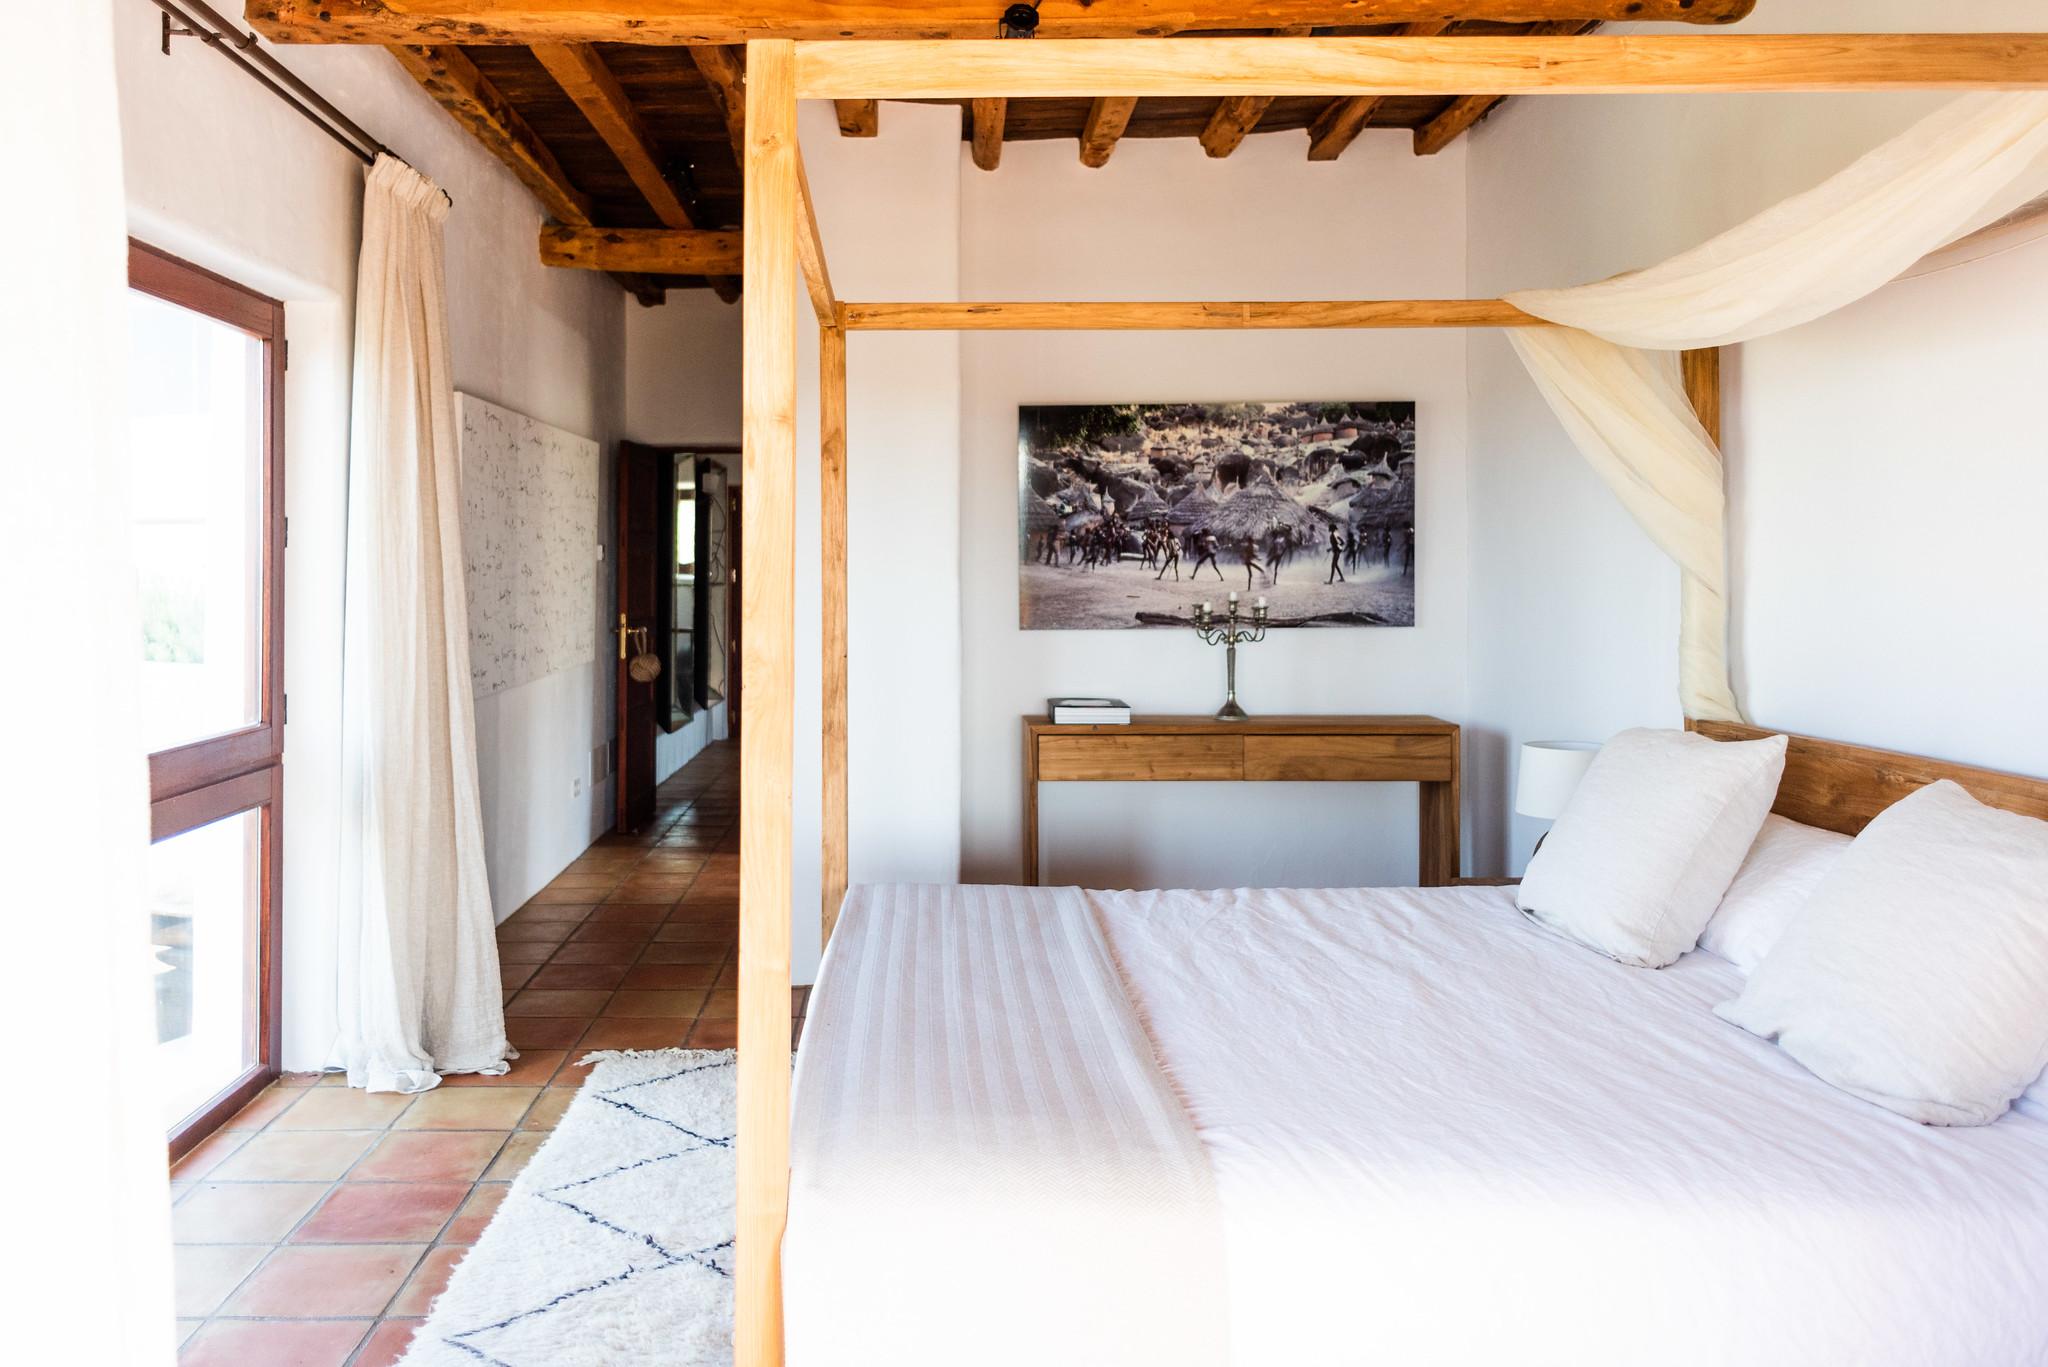 https://www.white-ibiza.com/wp-content/uploads/2020/05/white-ibiza-villas-can-lavanda-bedroom.jpg